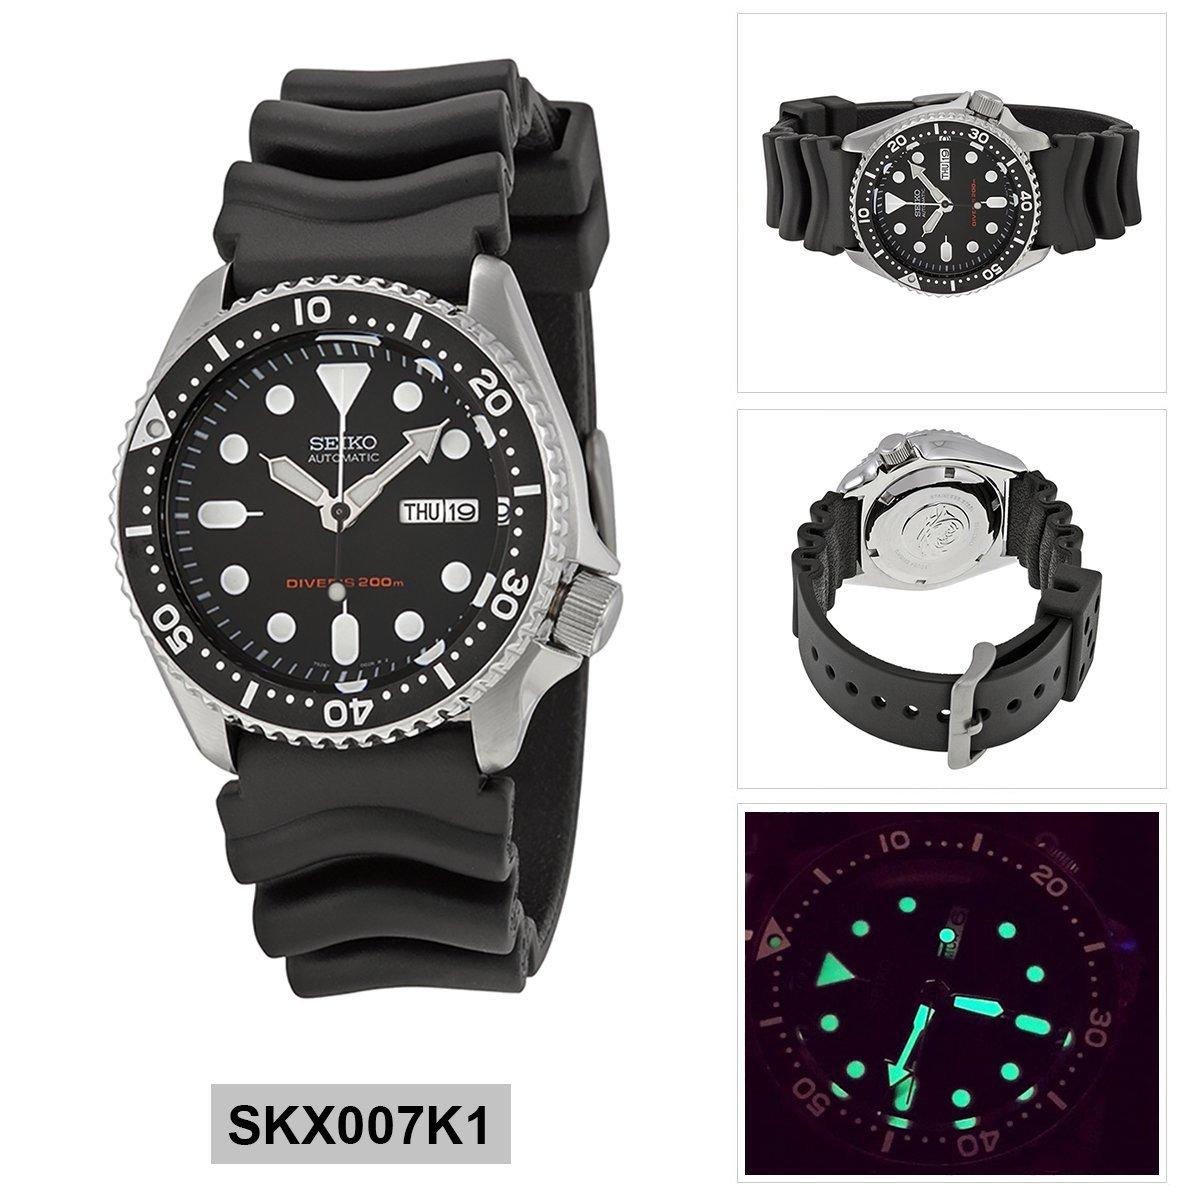 Seiko Divers Skx007k1 Mens Automatic Wristwatch Watches Skx007k2 200m Black Dial